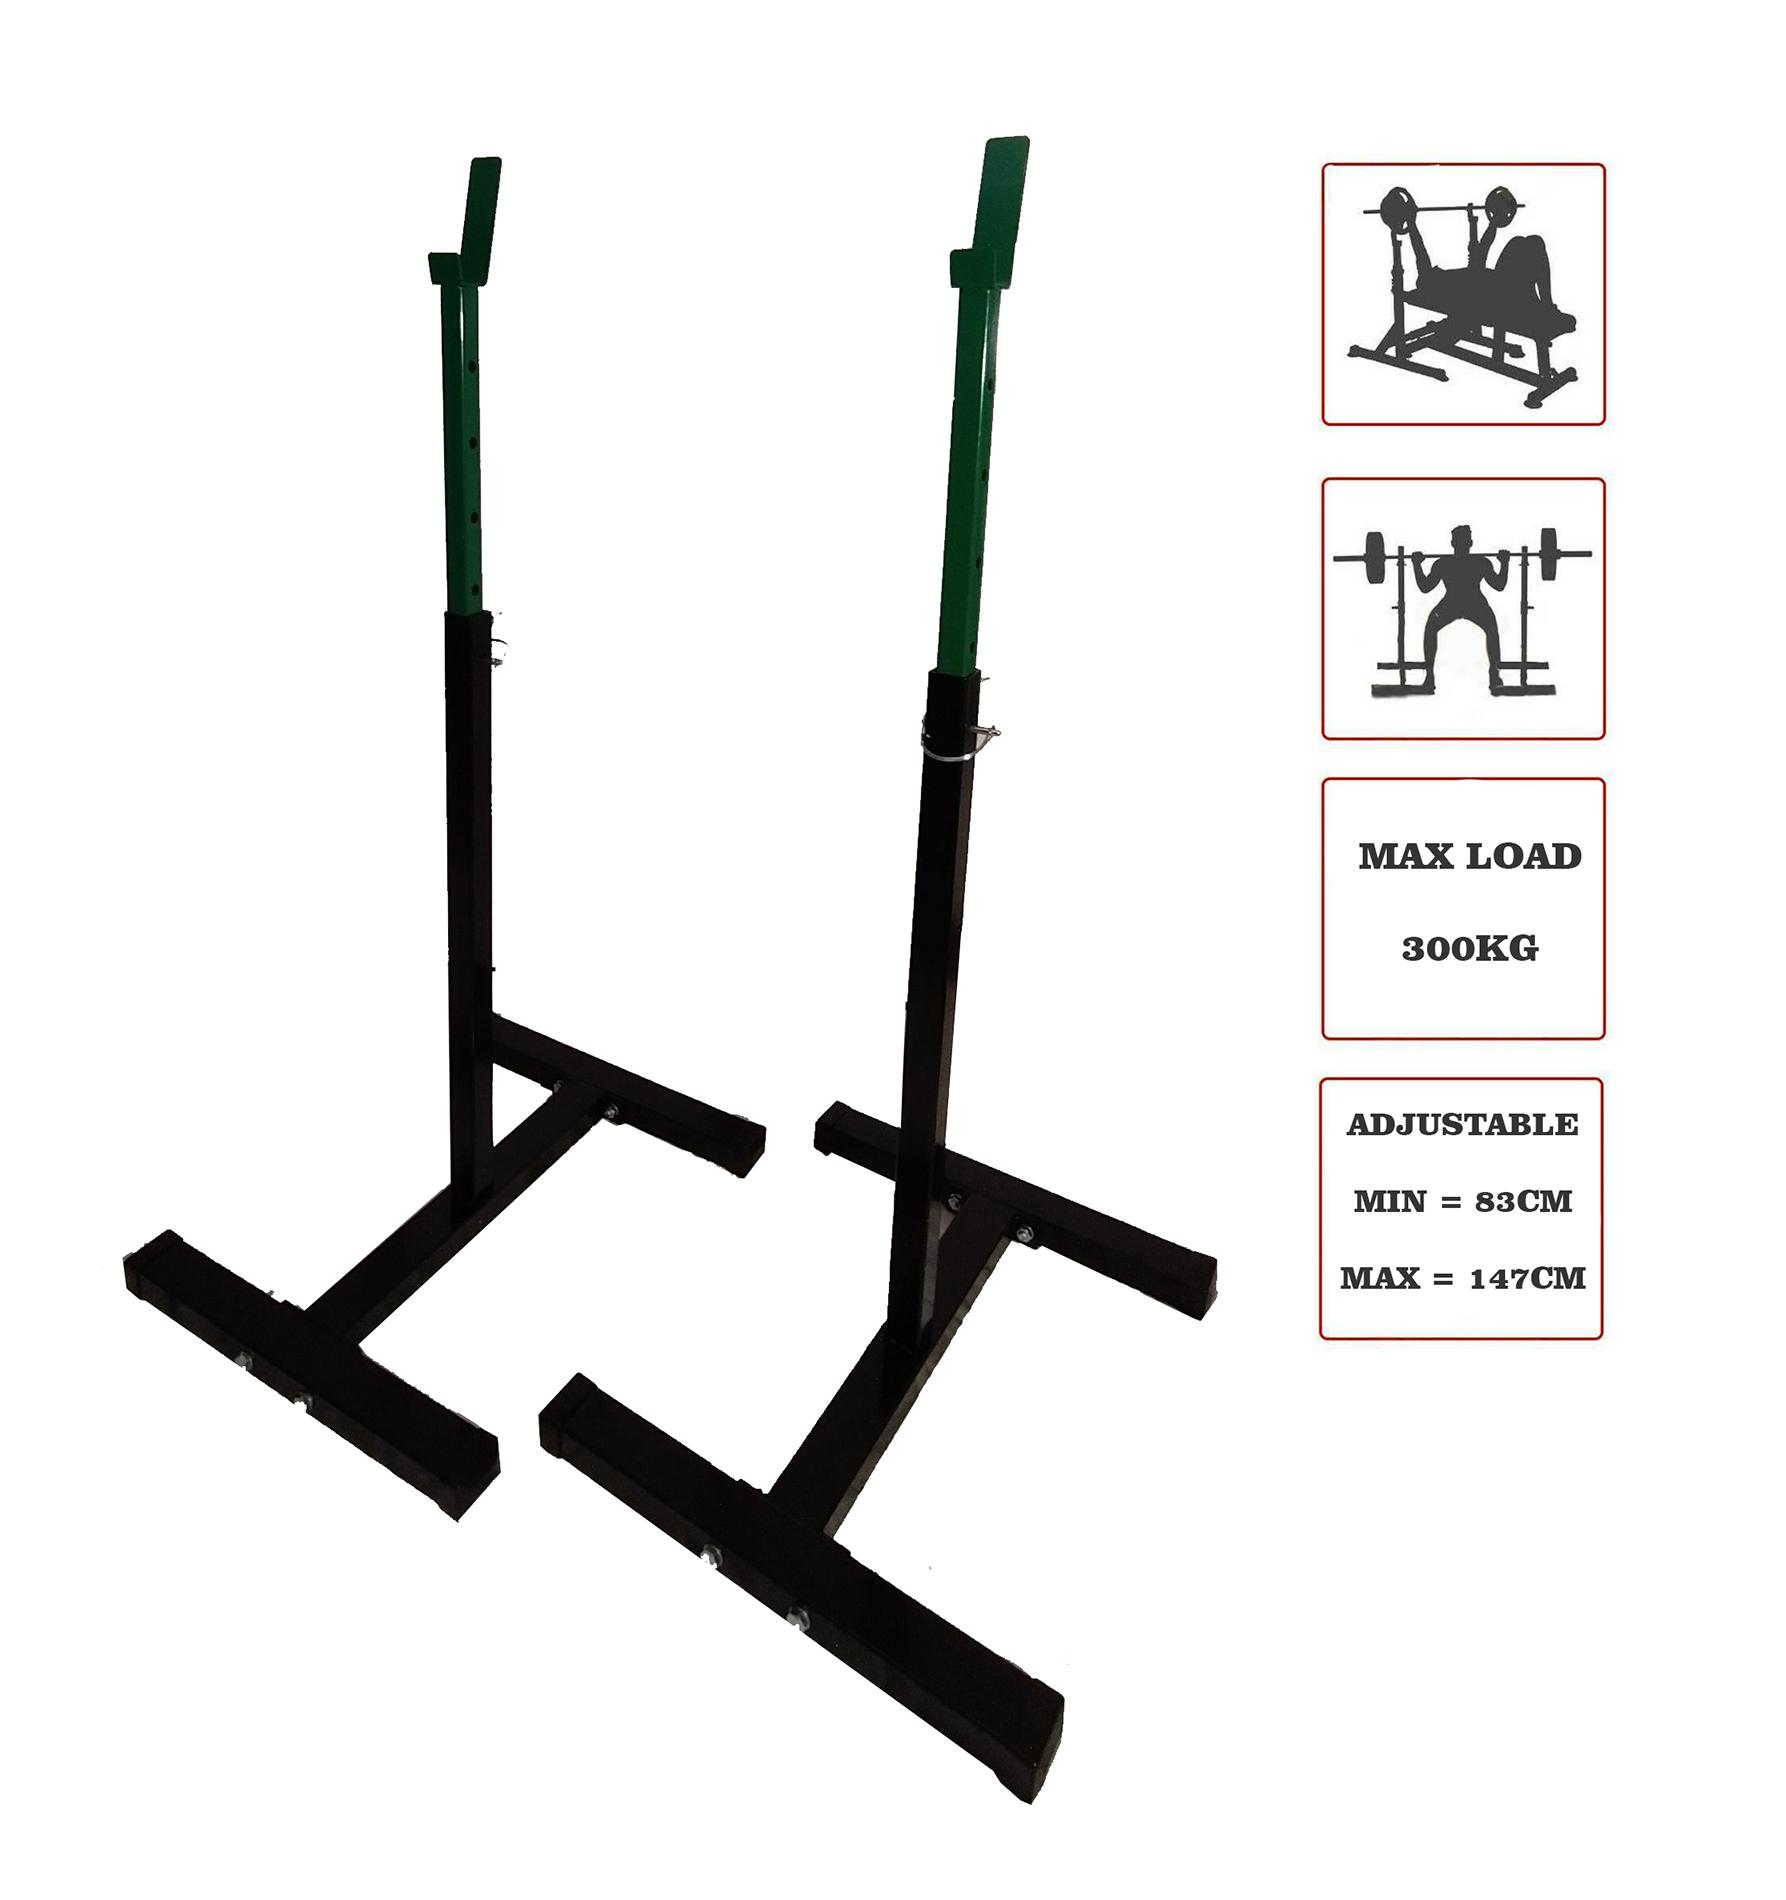 Squat stands, bench press rack